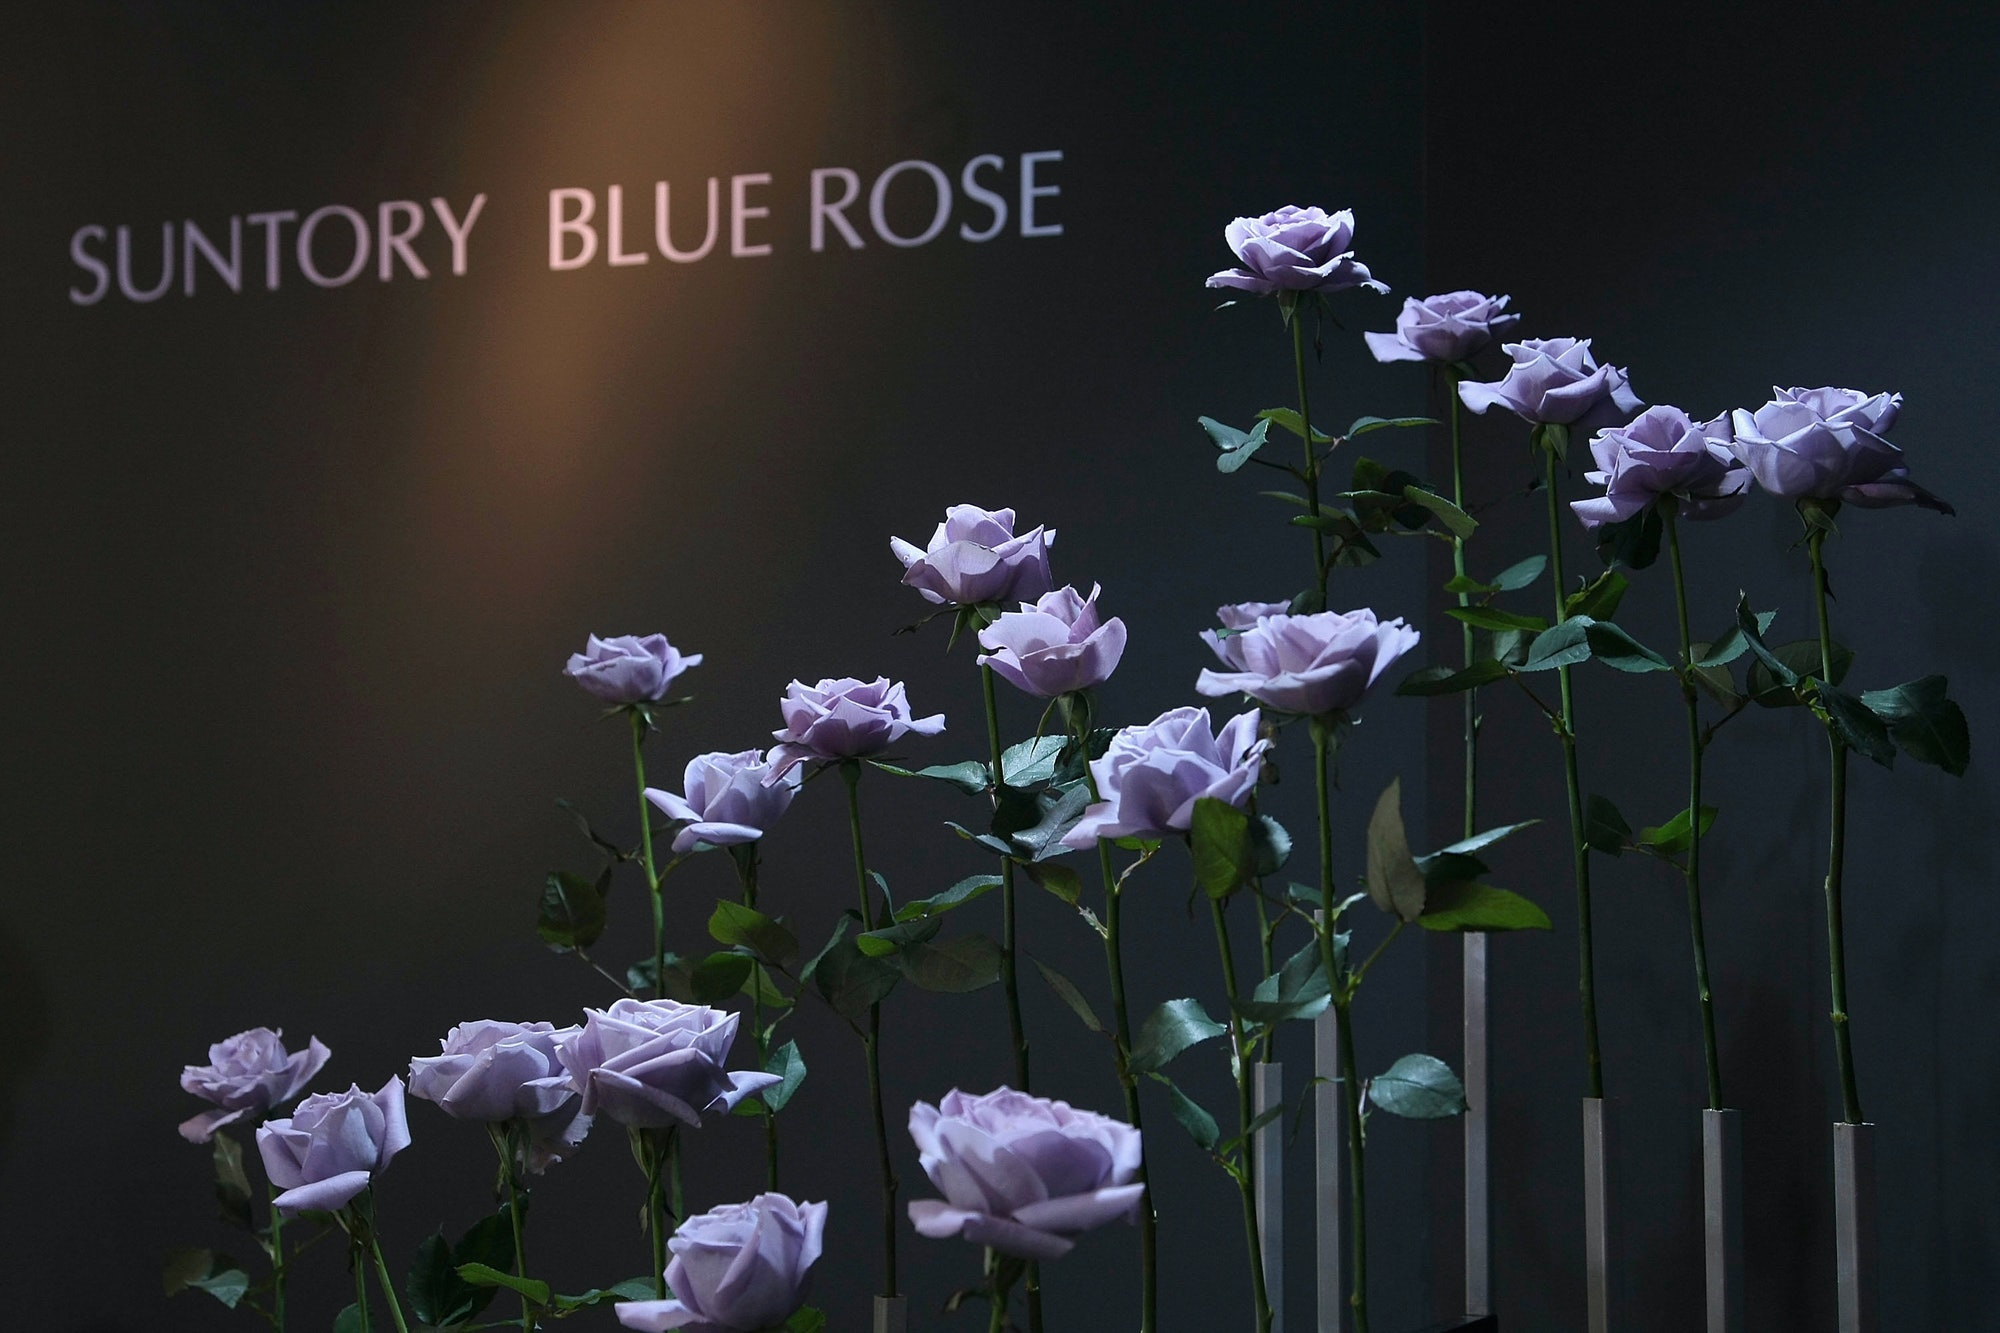 blue rose purple rose suntory brewing company roses